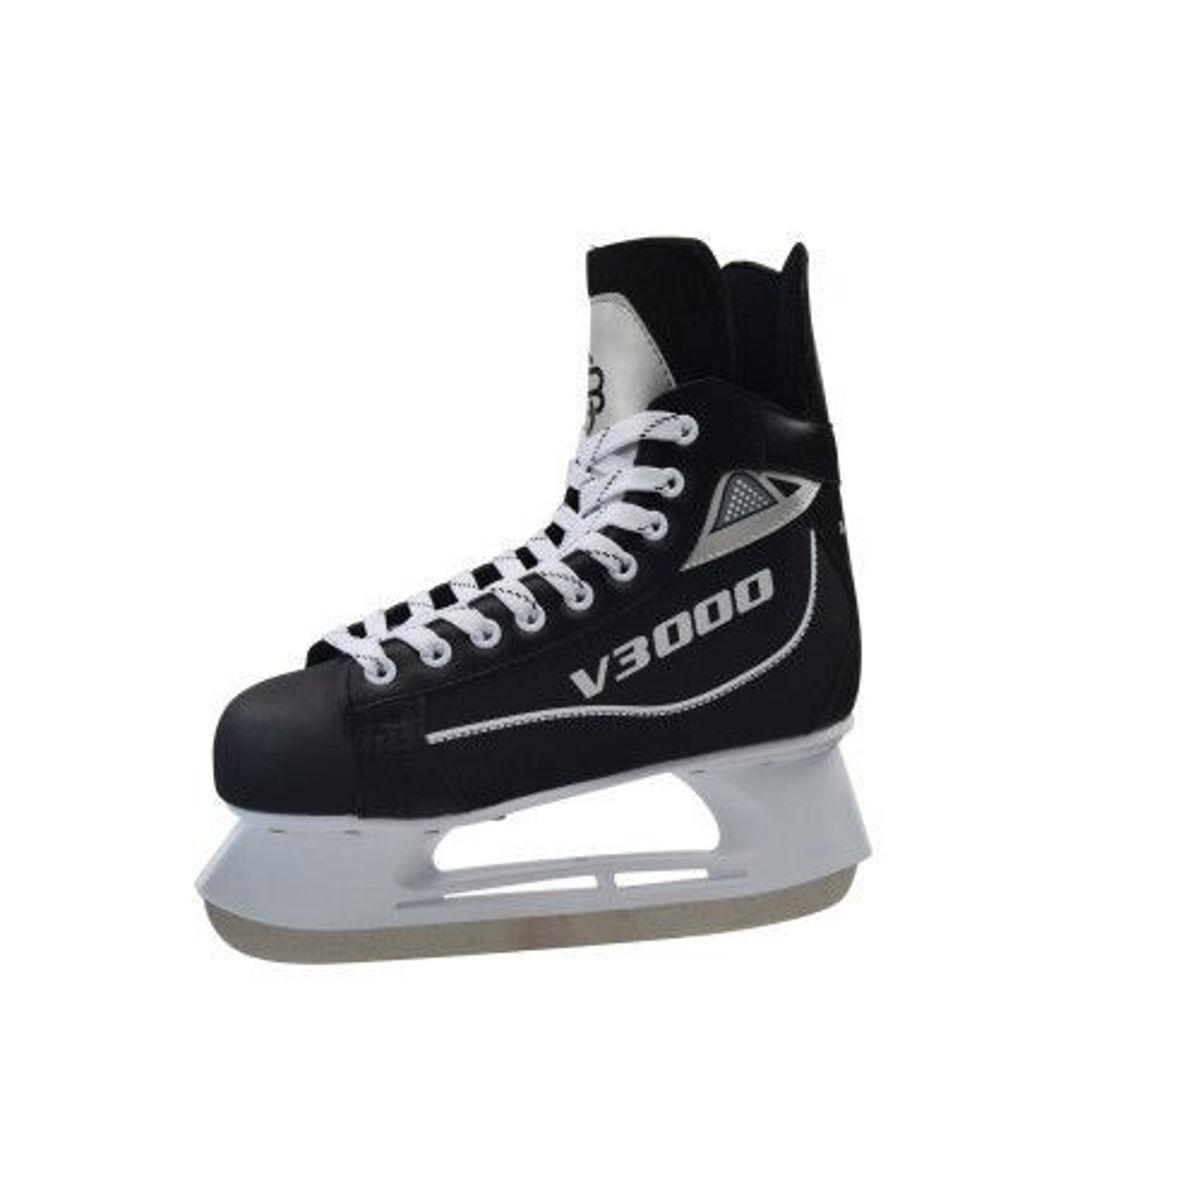 Bilde av Hockey V-3000 skøyte